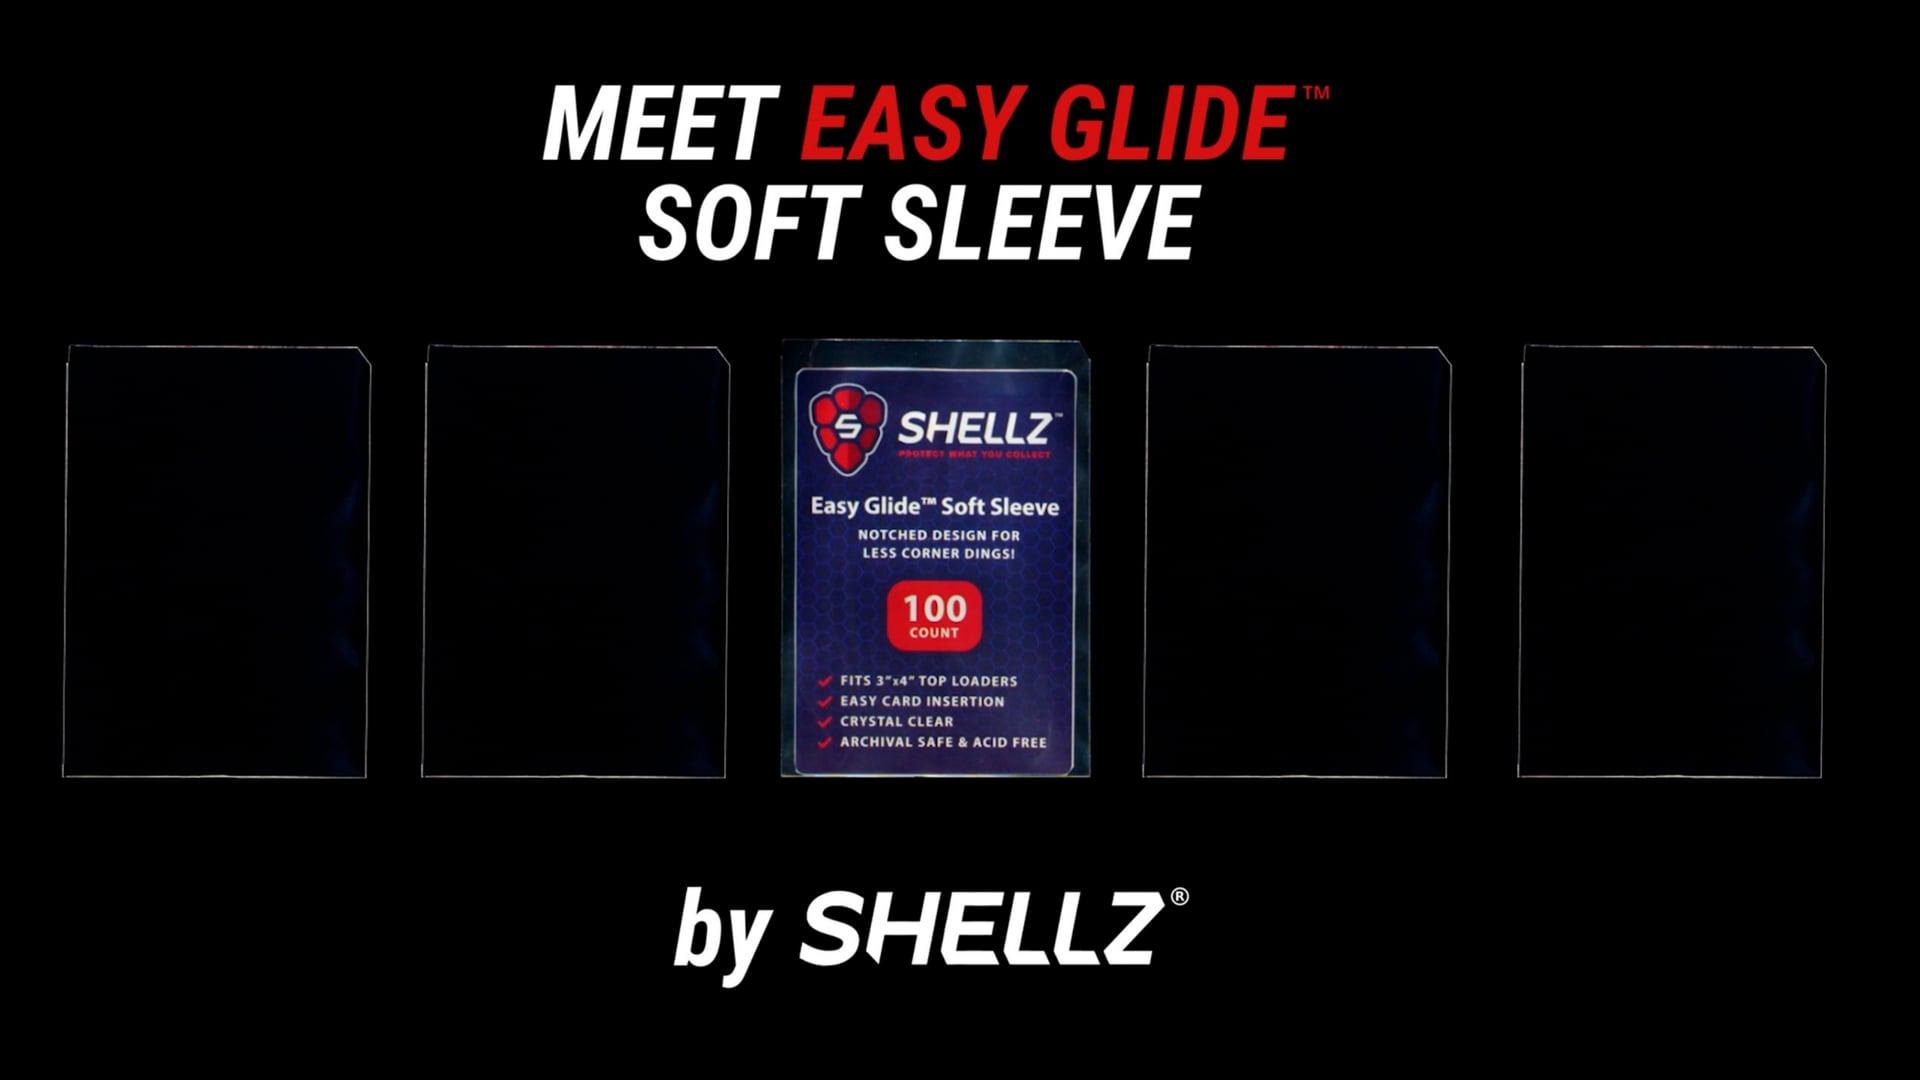 Shellz Easy Glide Soft Sleeve Commercial